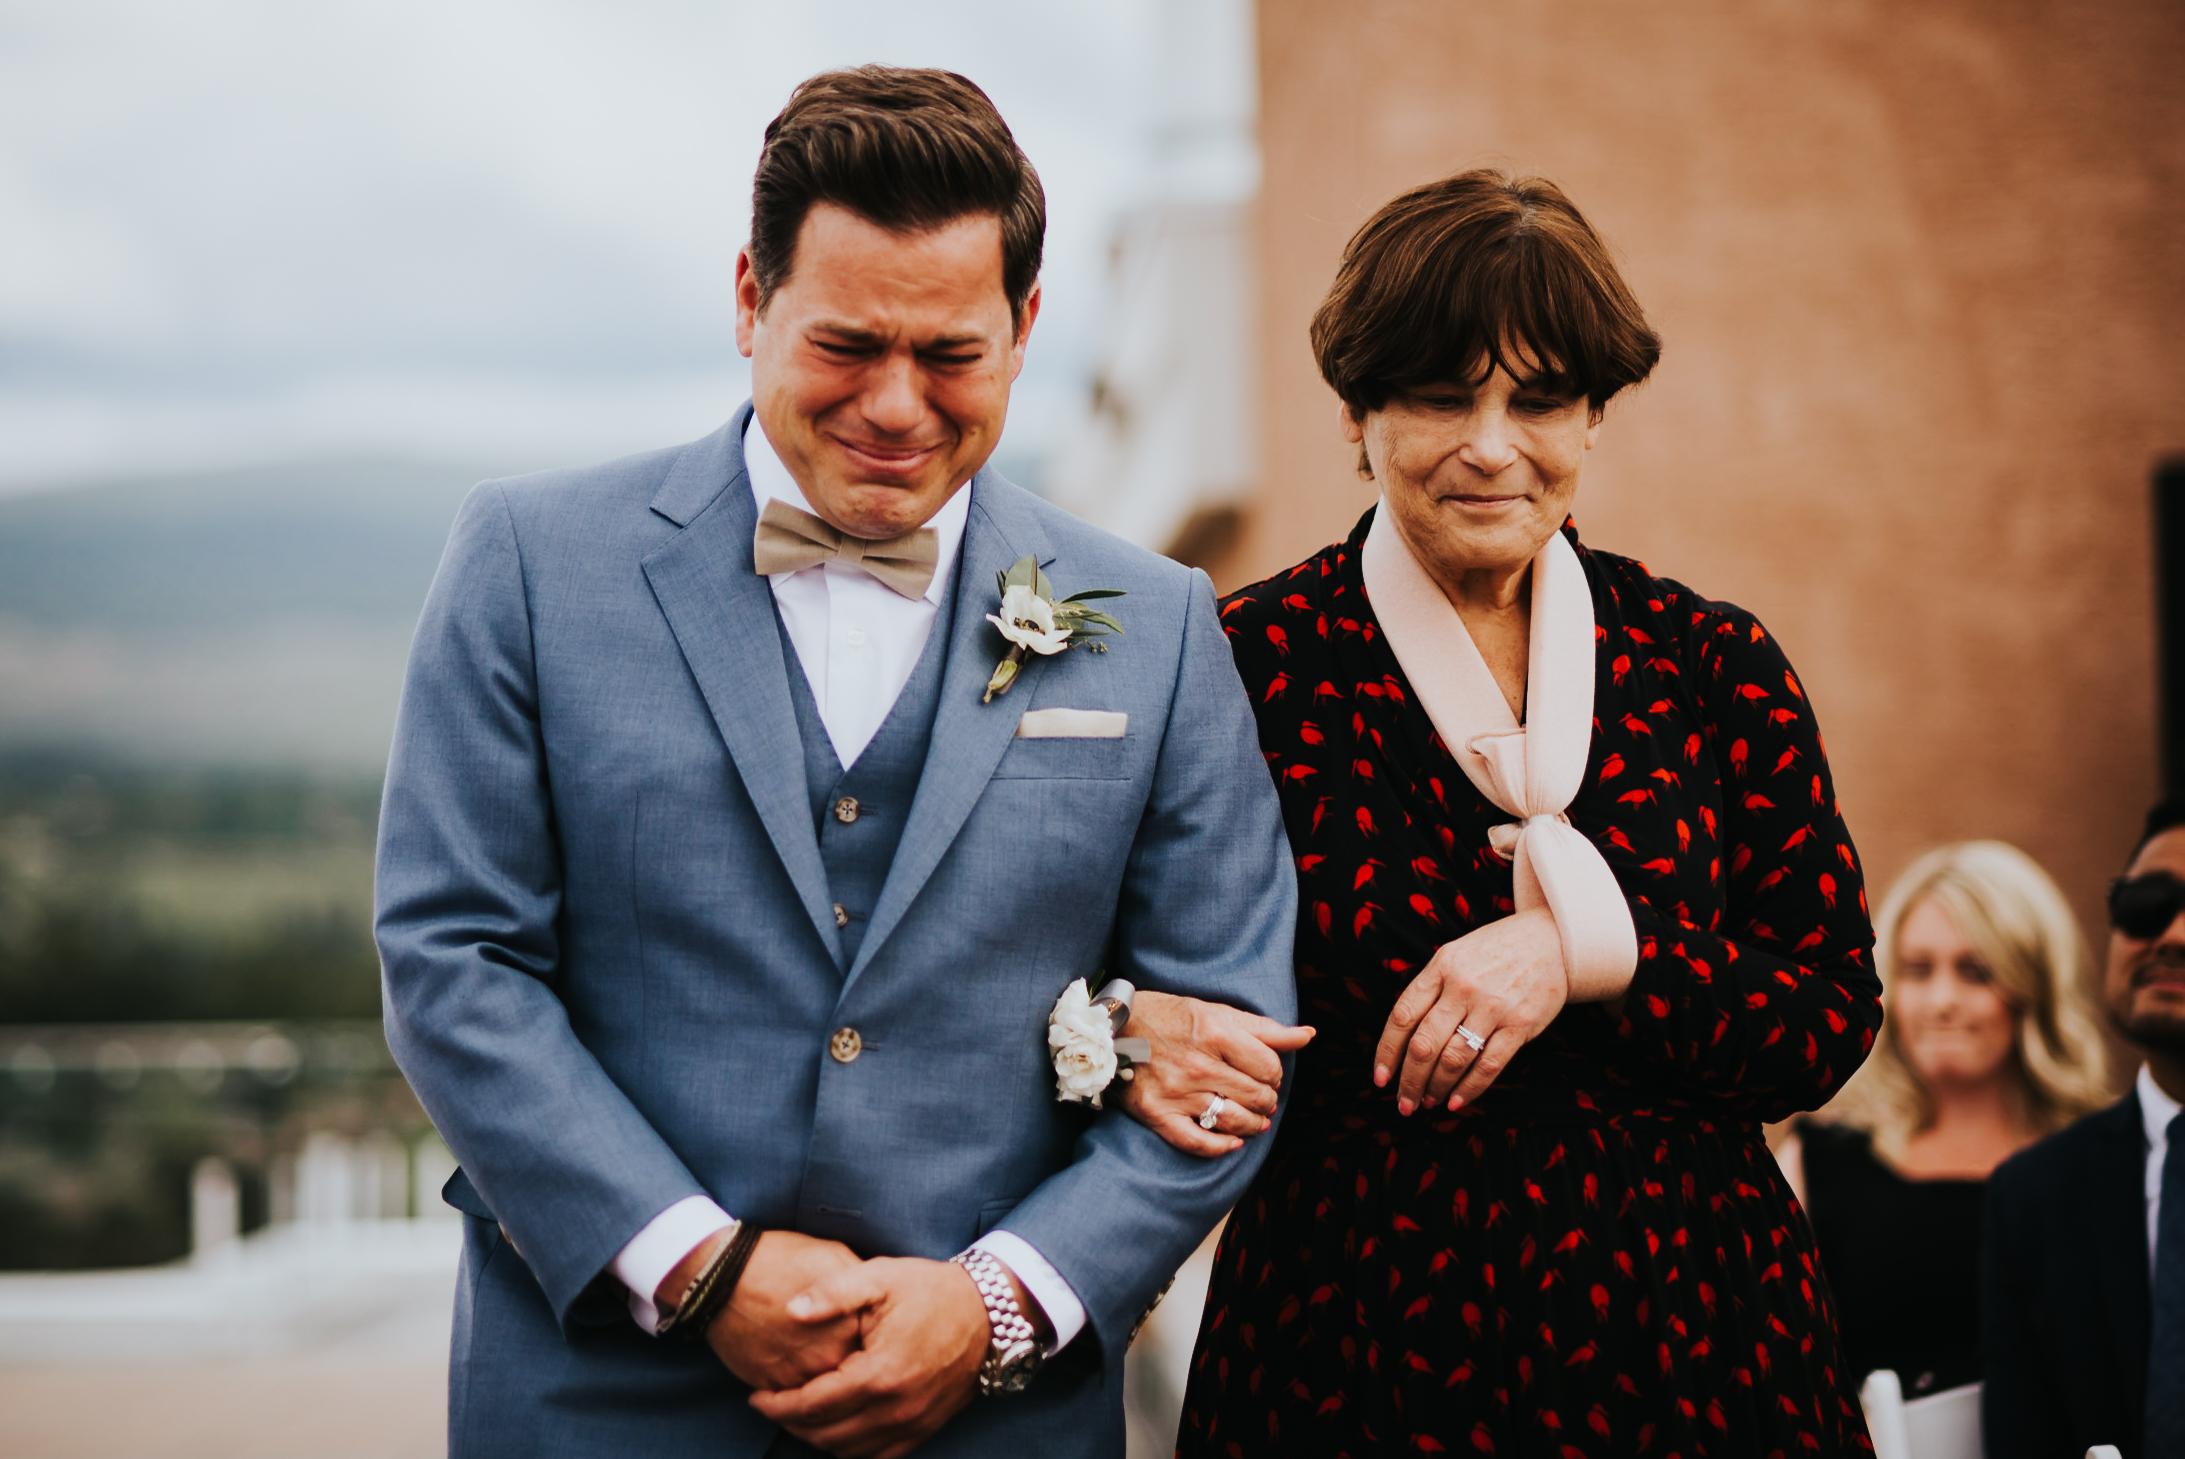 kelowna-wedding-photographer-1.jpg